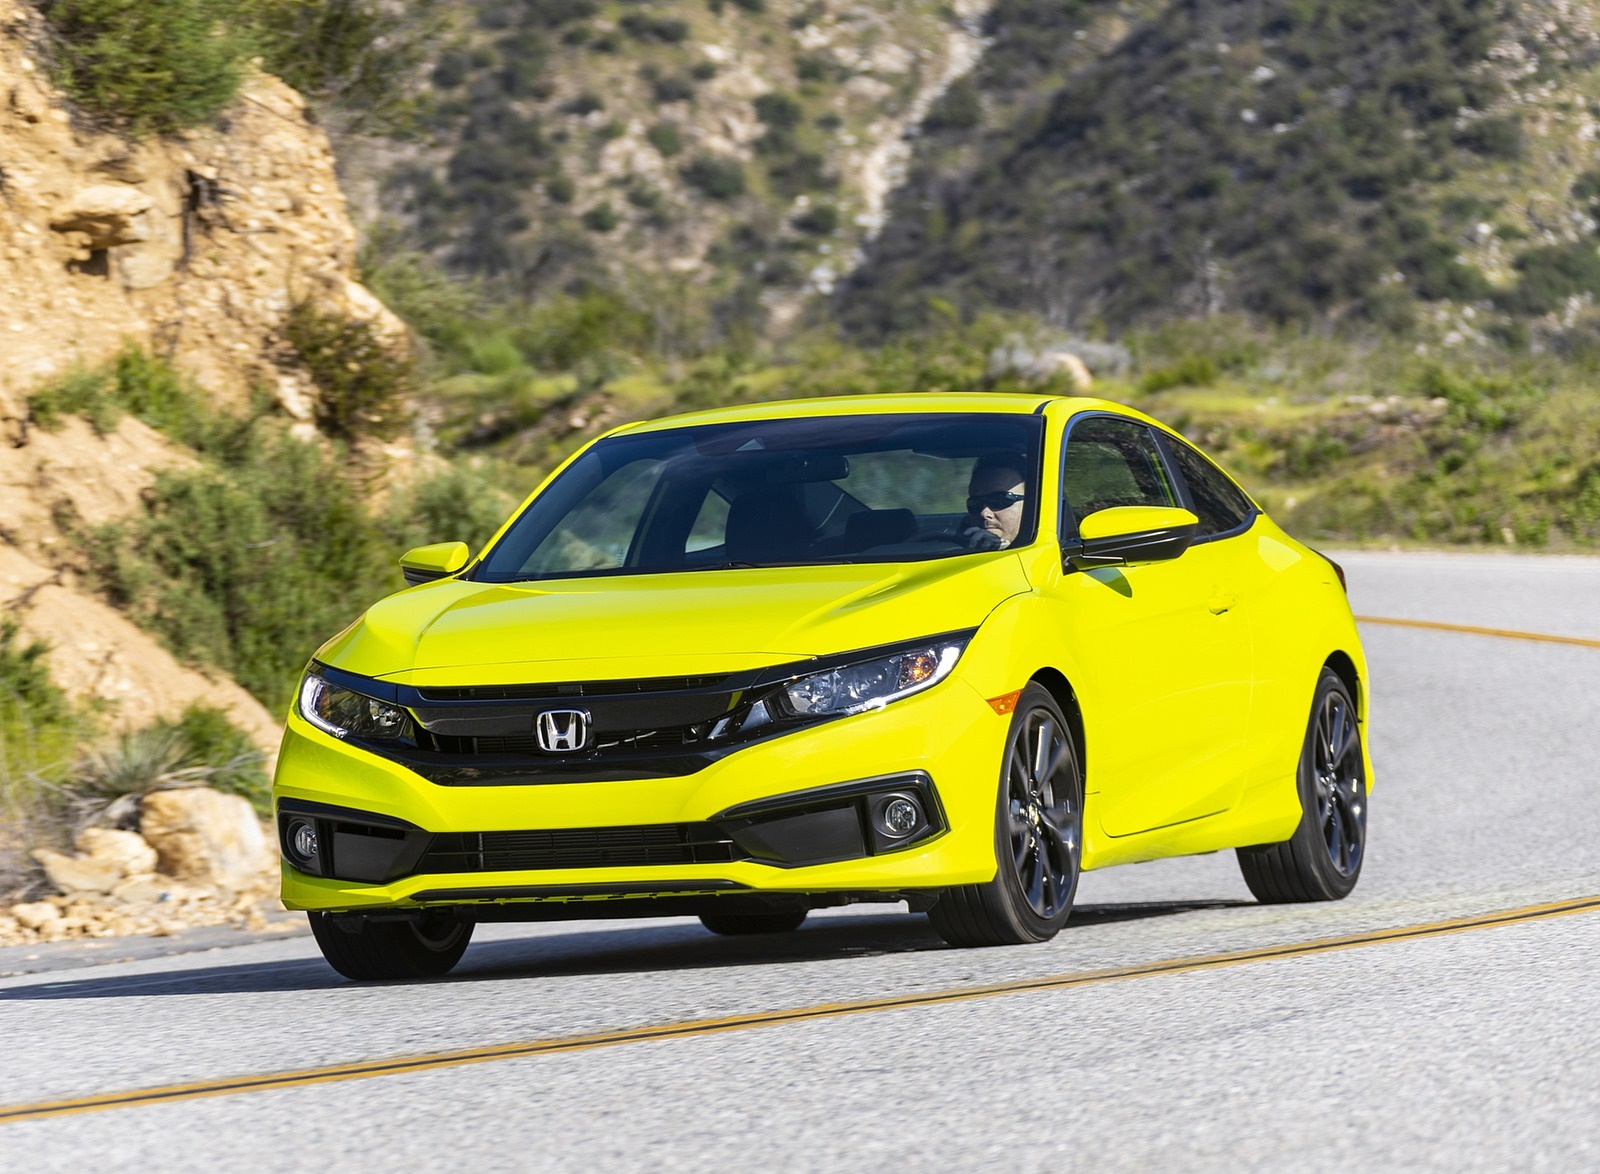 2016 honda civic sedan 389 photos 2016 honda clarity fuel cell 22 photos. 2020 Honda Civic Coupe Wallpapers 67 Hd Images Newcarcars